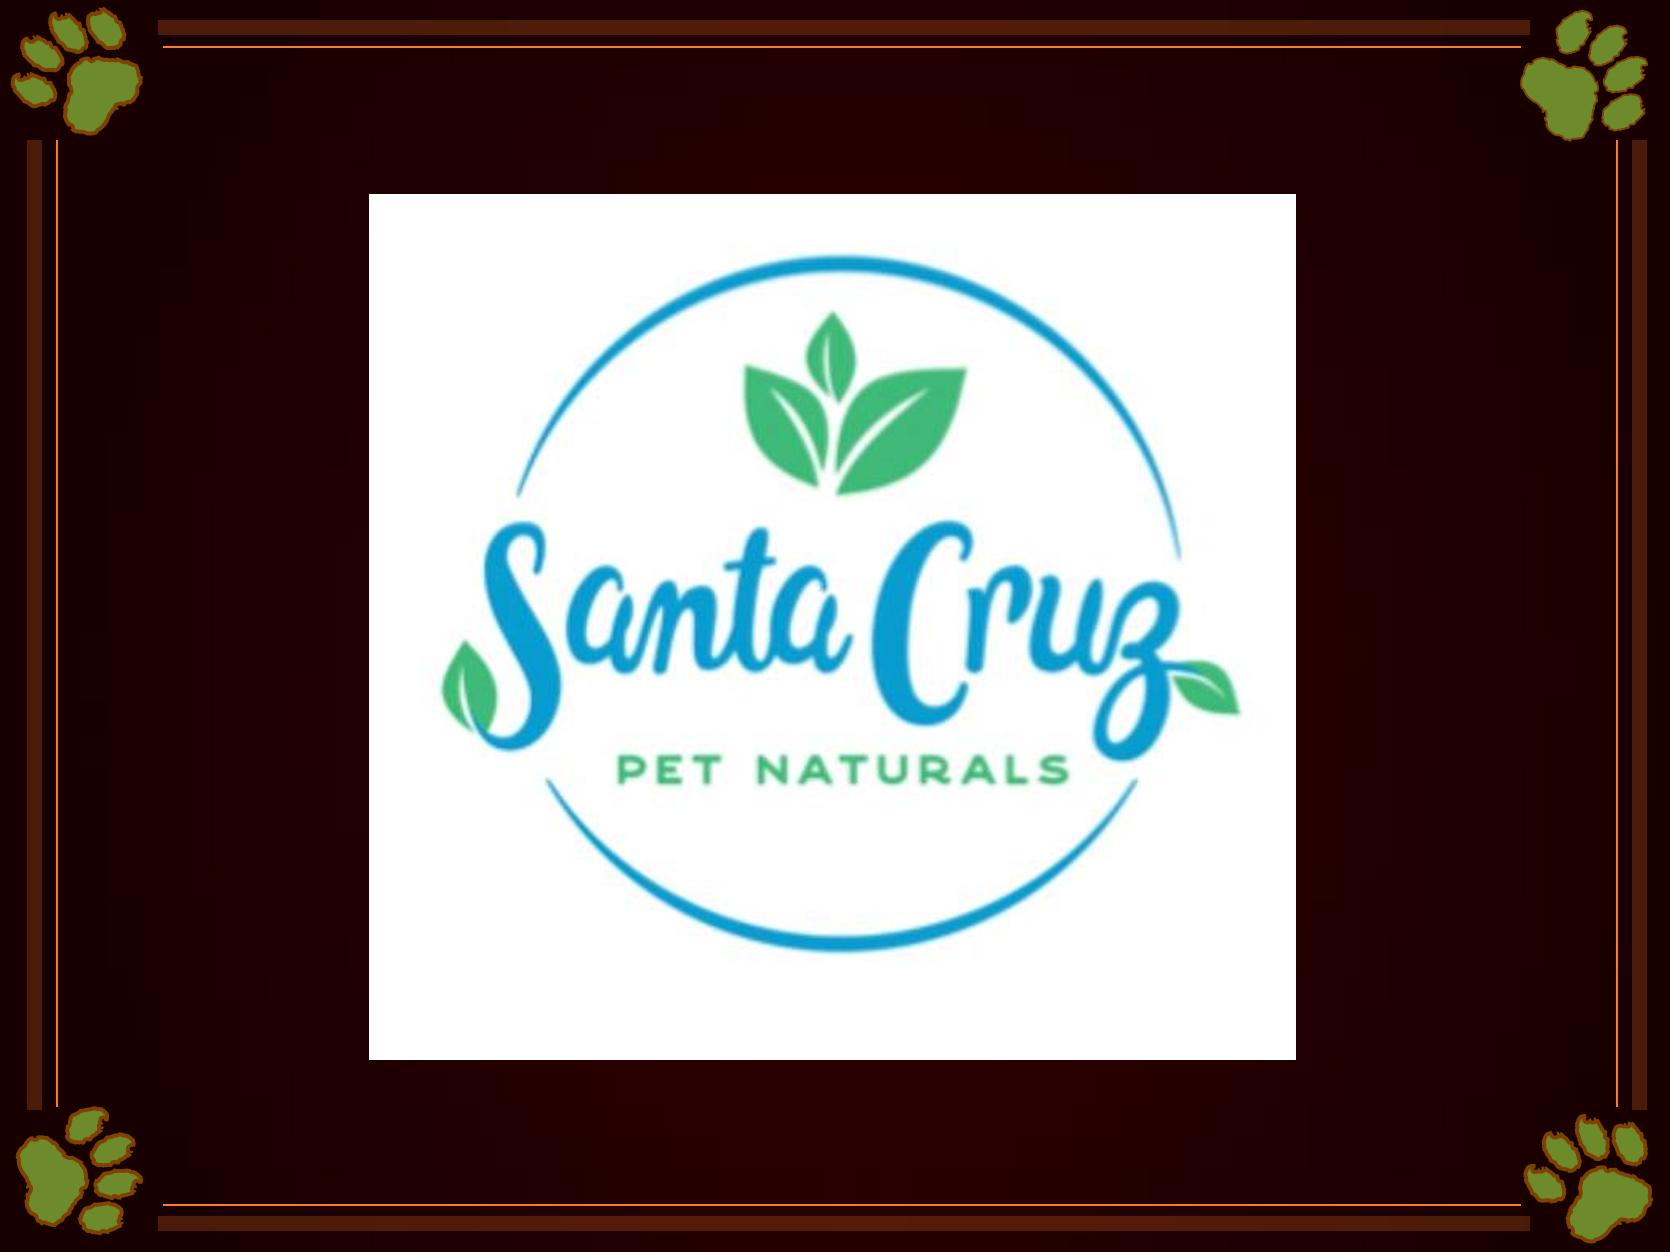 Santa-cruz-pet-naturals-logo.jpg